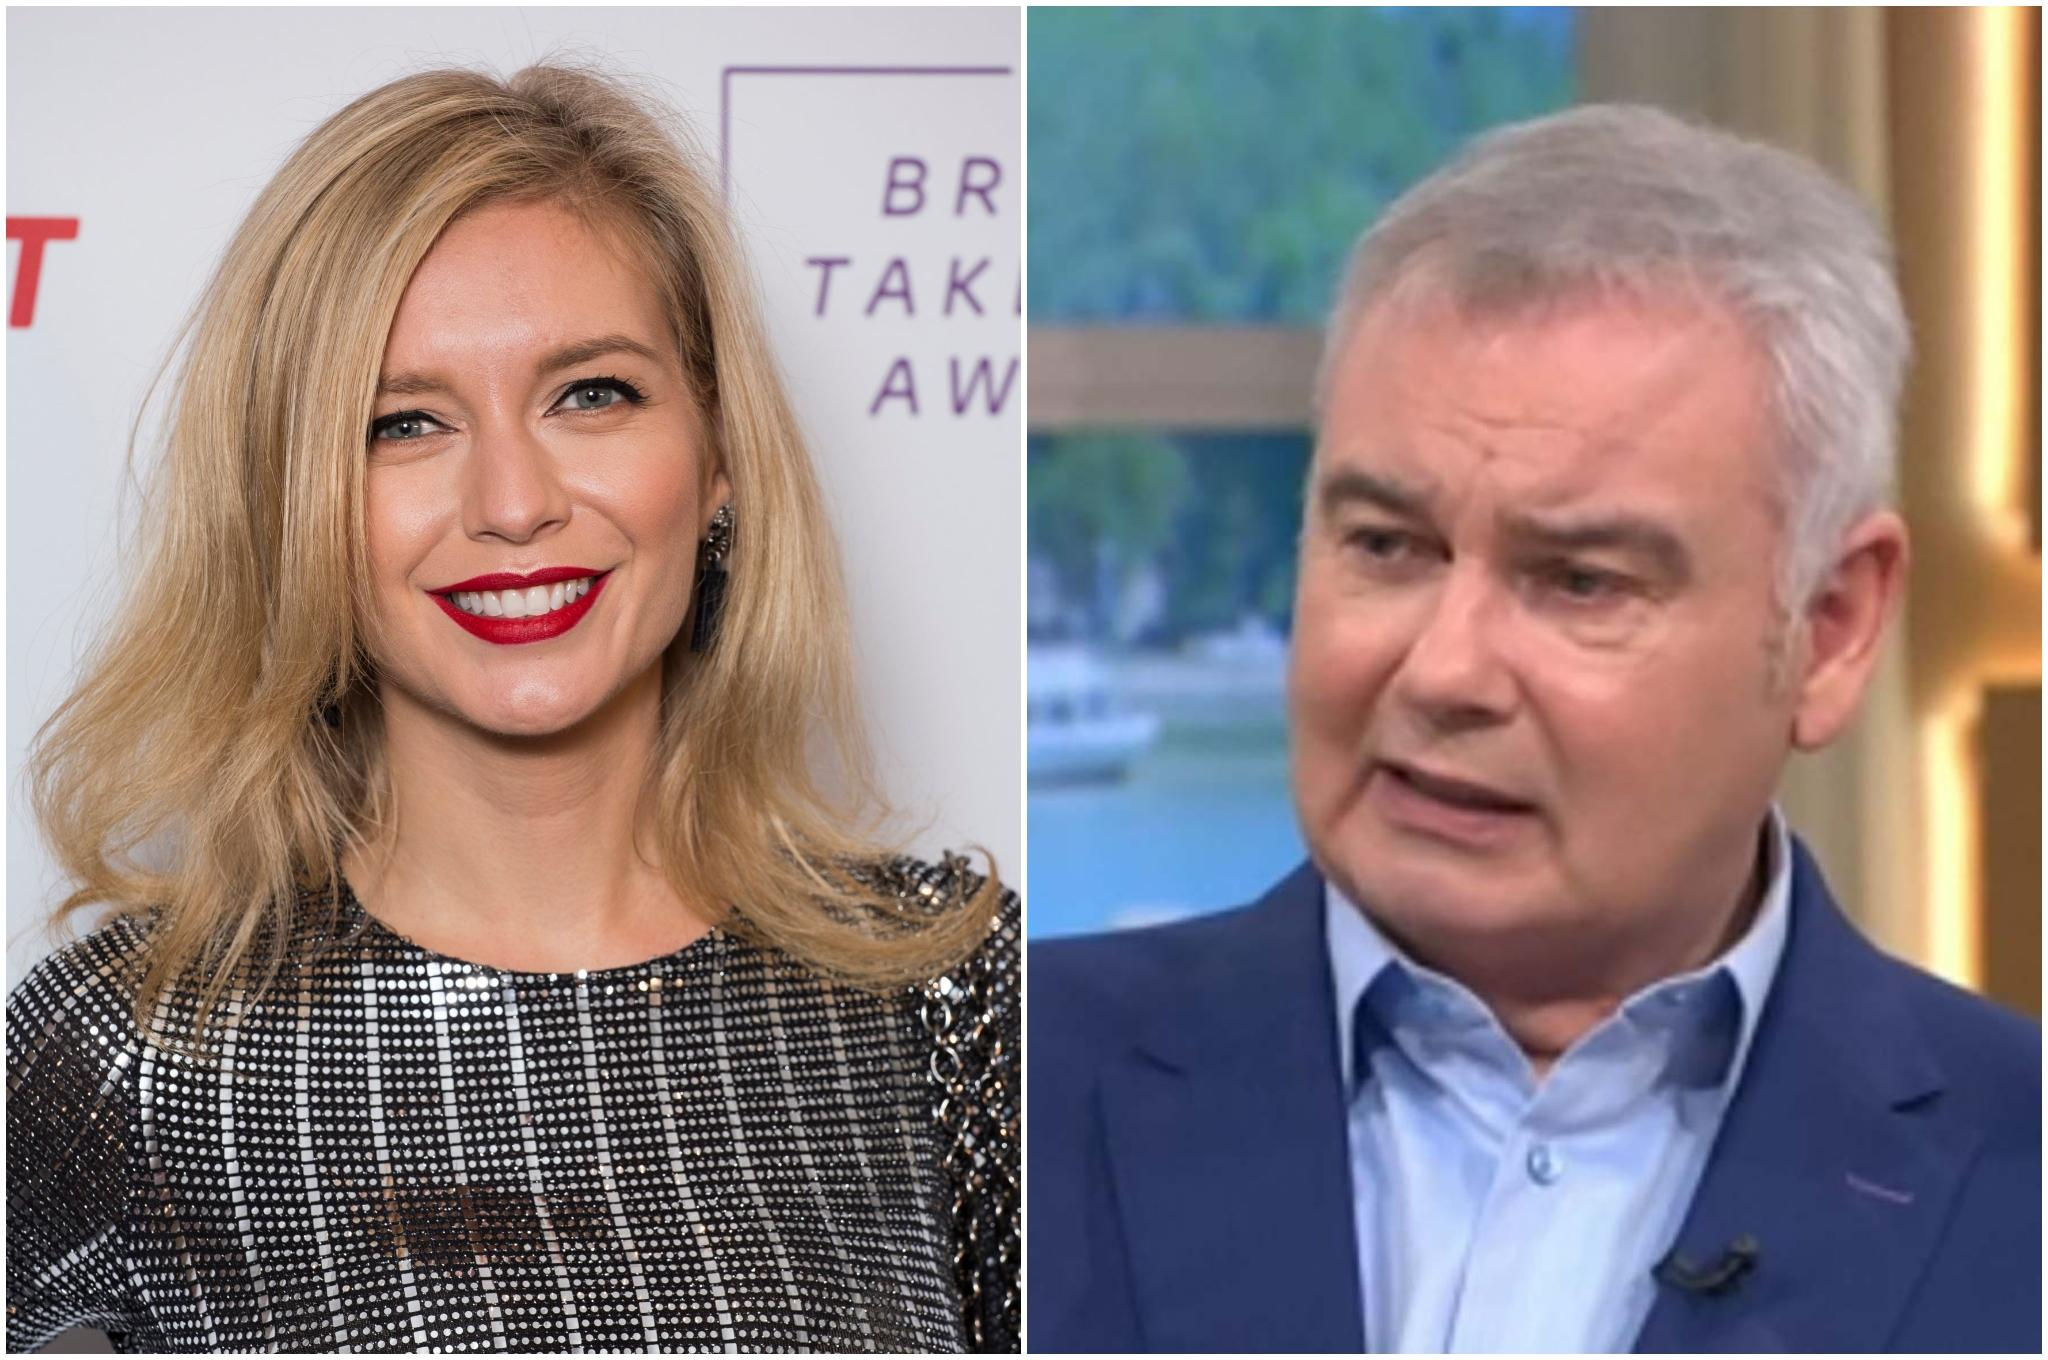 Coronavirus: Rachel Riley criticises Eamonn Holmes over 'dangerous' 5G comments